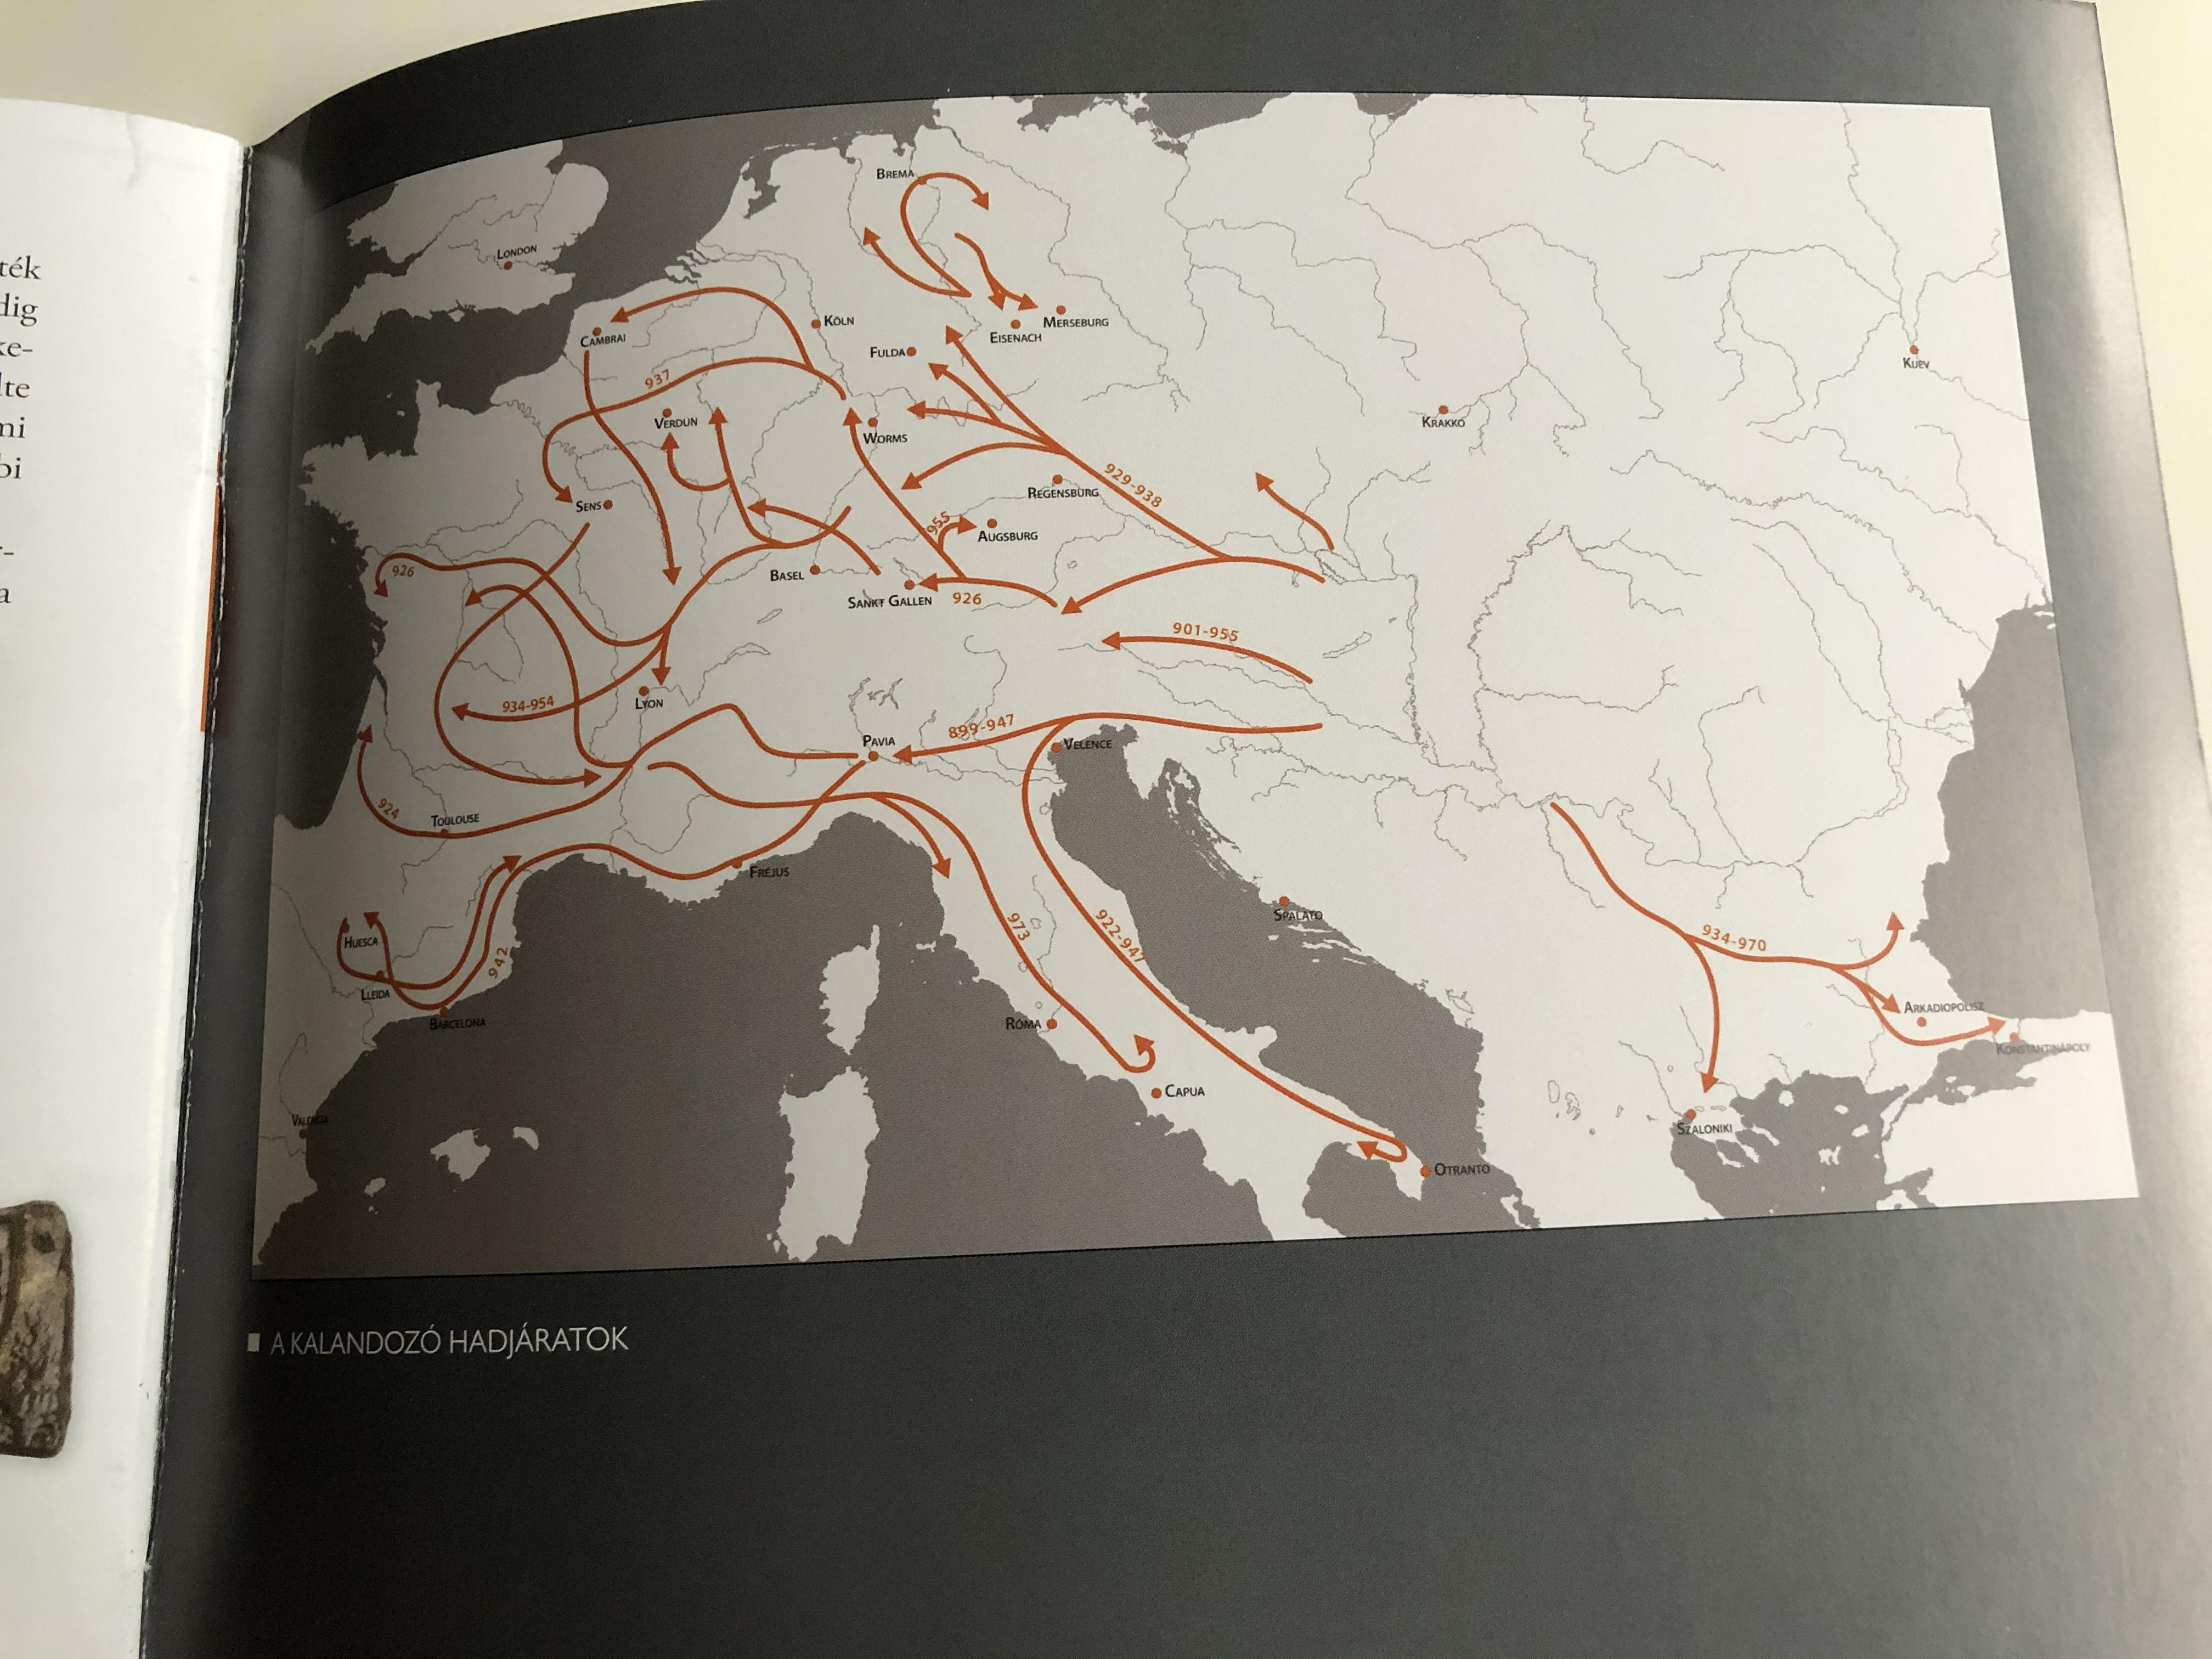 a-k-rp-t-medence-a-karoling-korban-s-a-honfoglal-s-kor-ban-a-magyar-nemzeti-m-zeum-r-g-szeti-ki-ll-t-s-nak-vezet-je-paperback-2014-history-of-the-carpathian-basin-in-the-age-of-karolings-and-the-age-of-hungarian-conqu-7471214-.jpg